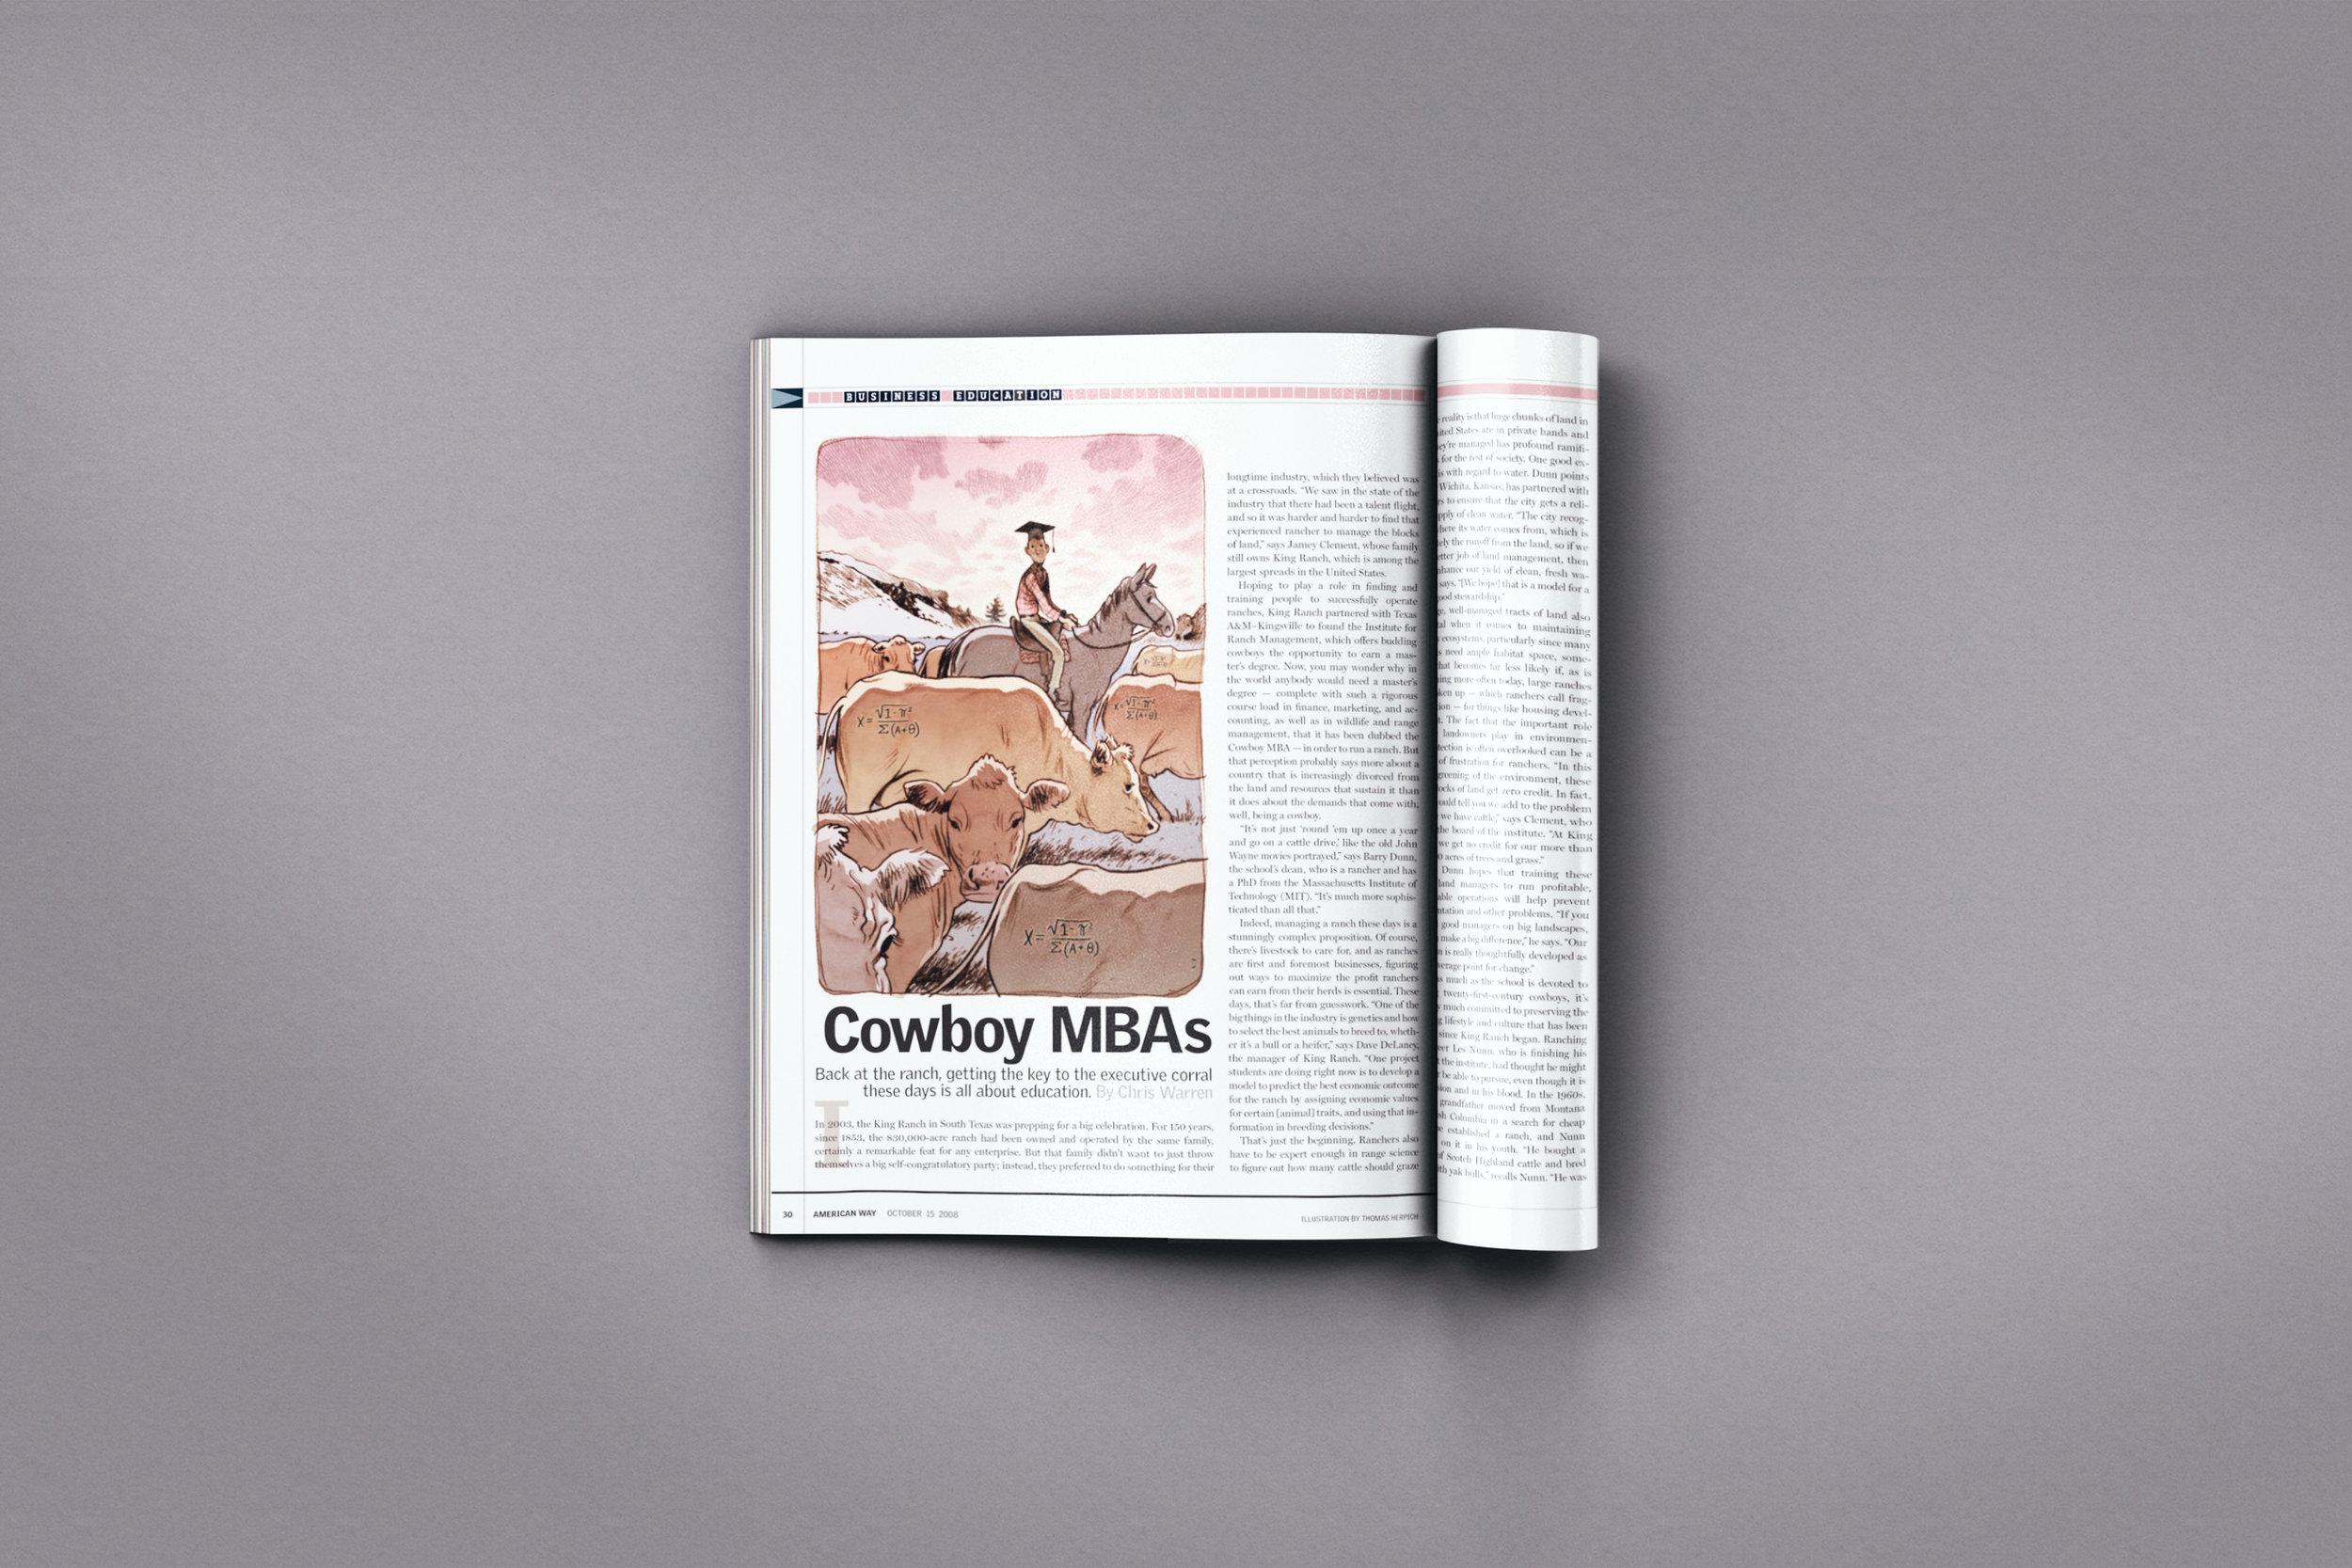 ronaldvillegas-illustration-americanway-cowboymbas.jpg